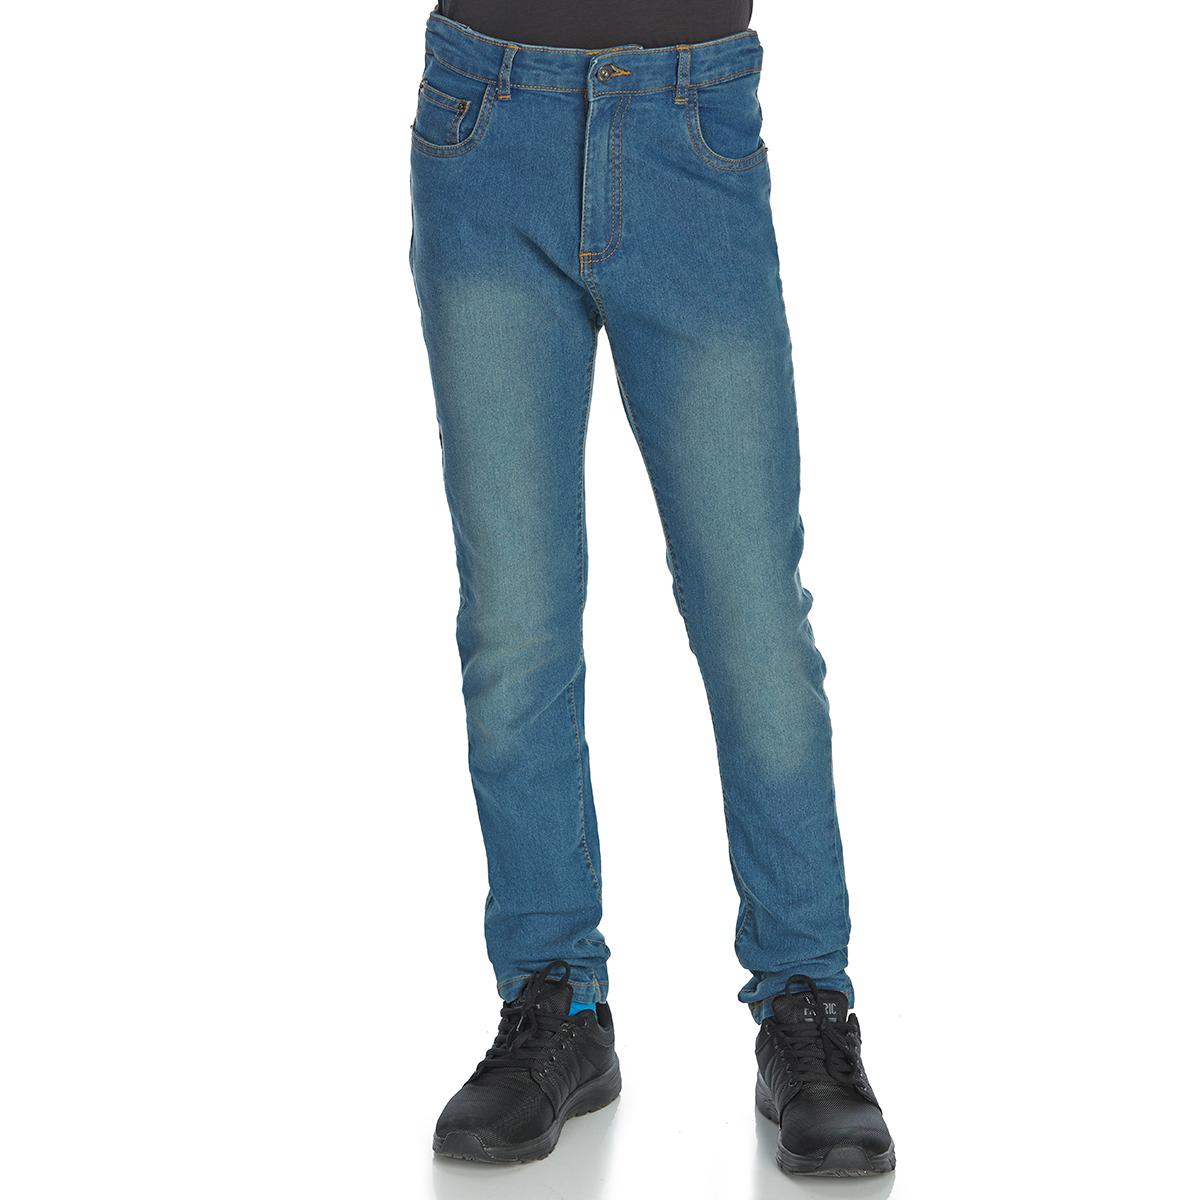 Minoti Big Boys' Skinny Denim Jeans - Blue, 9-10